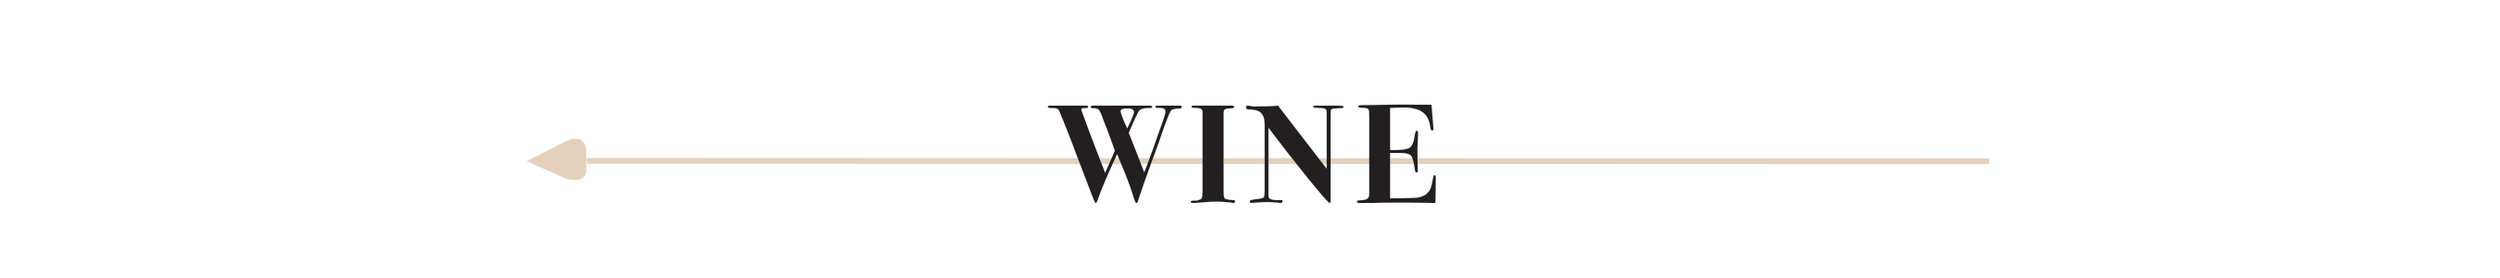 WINE Header.jpg